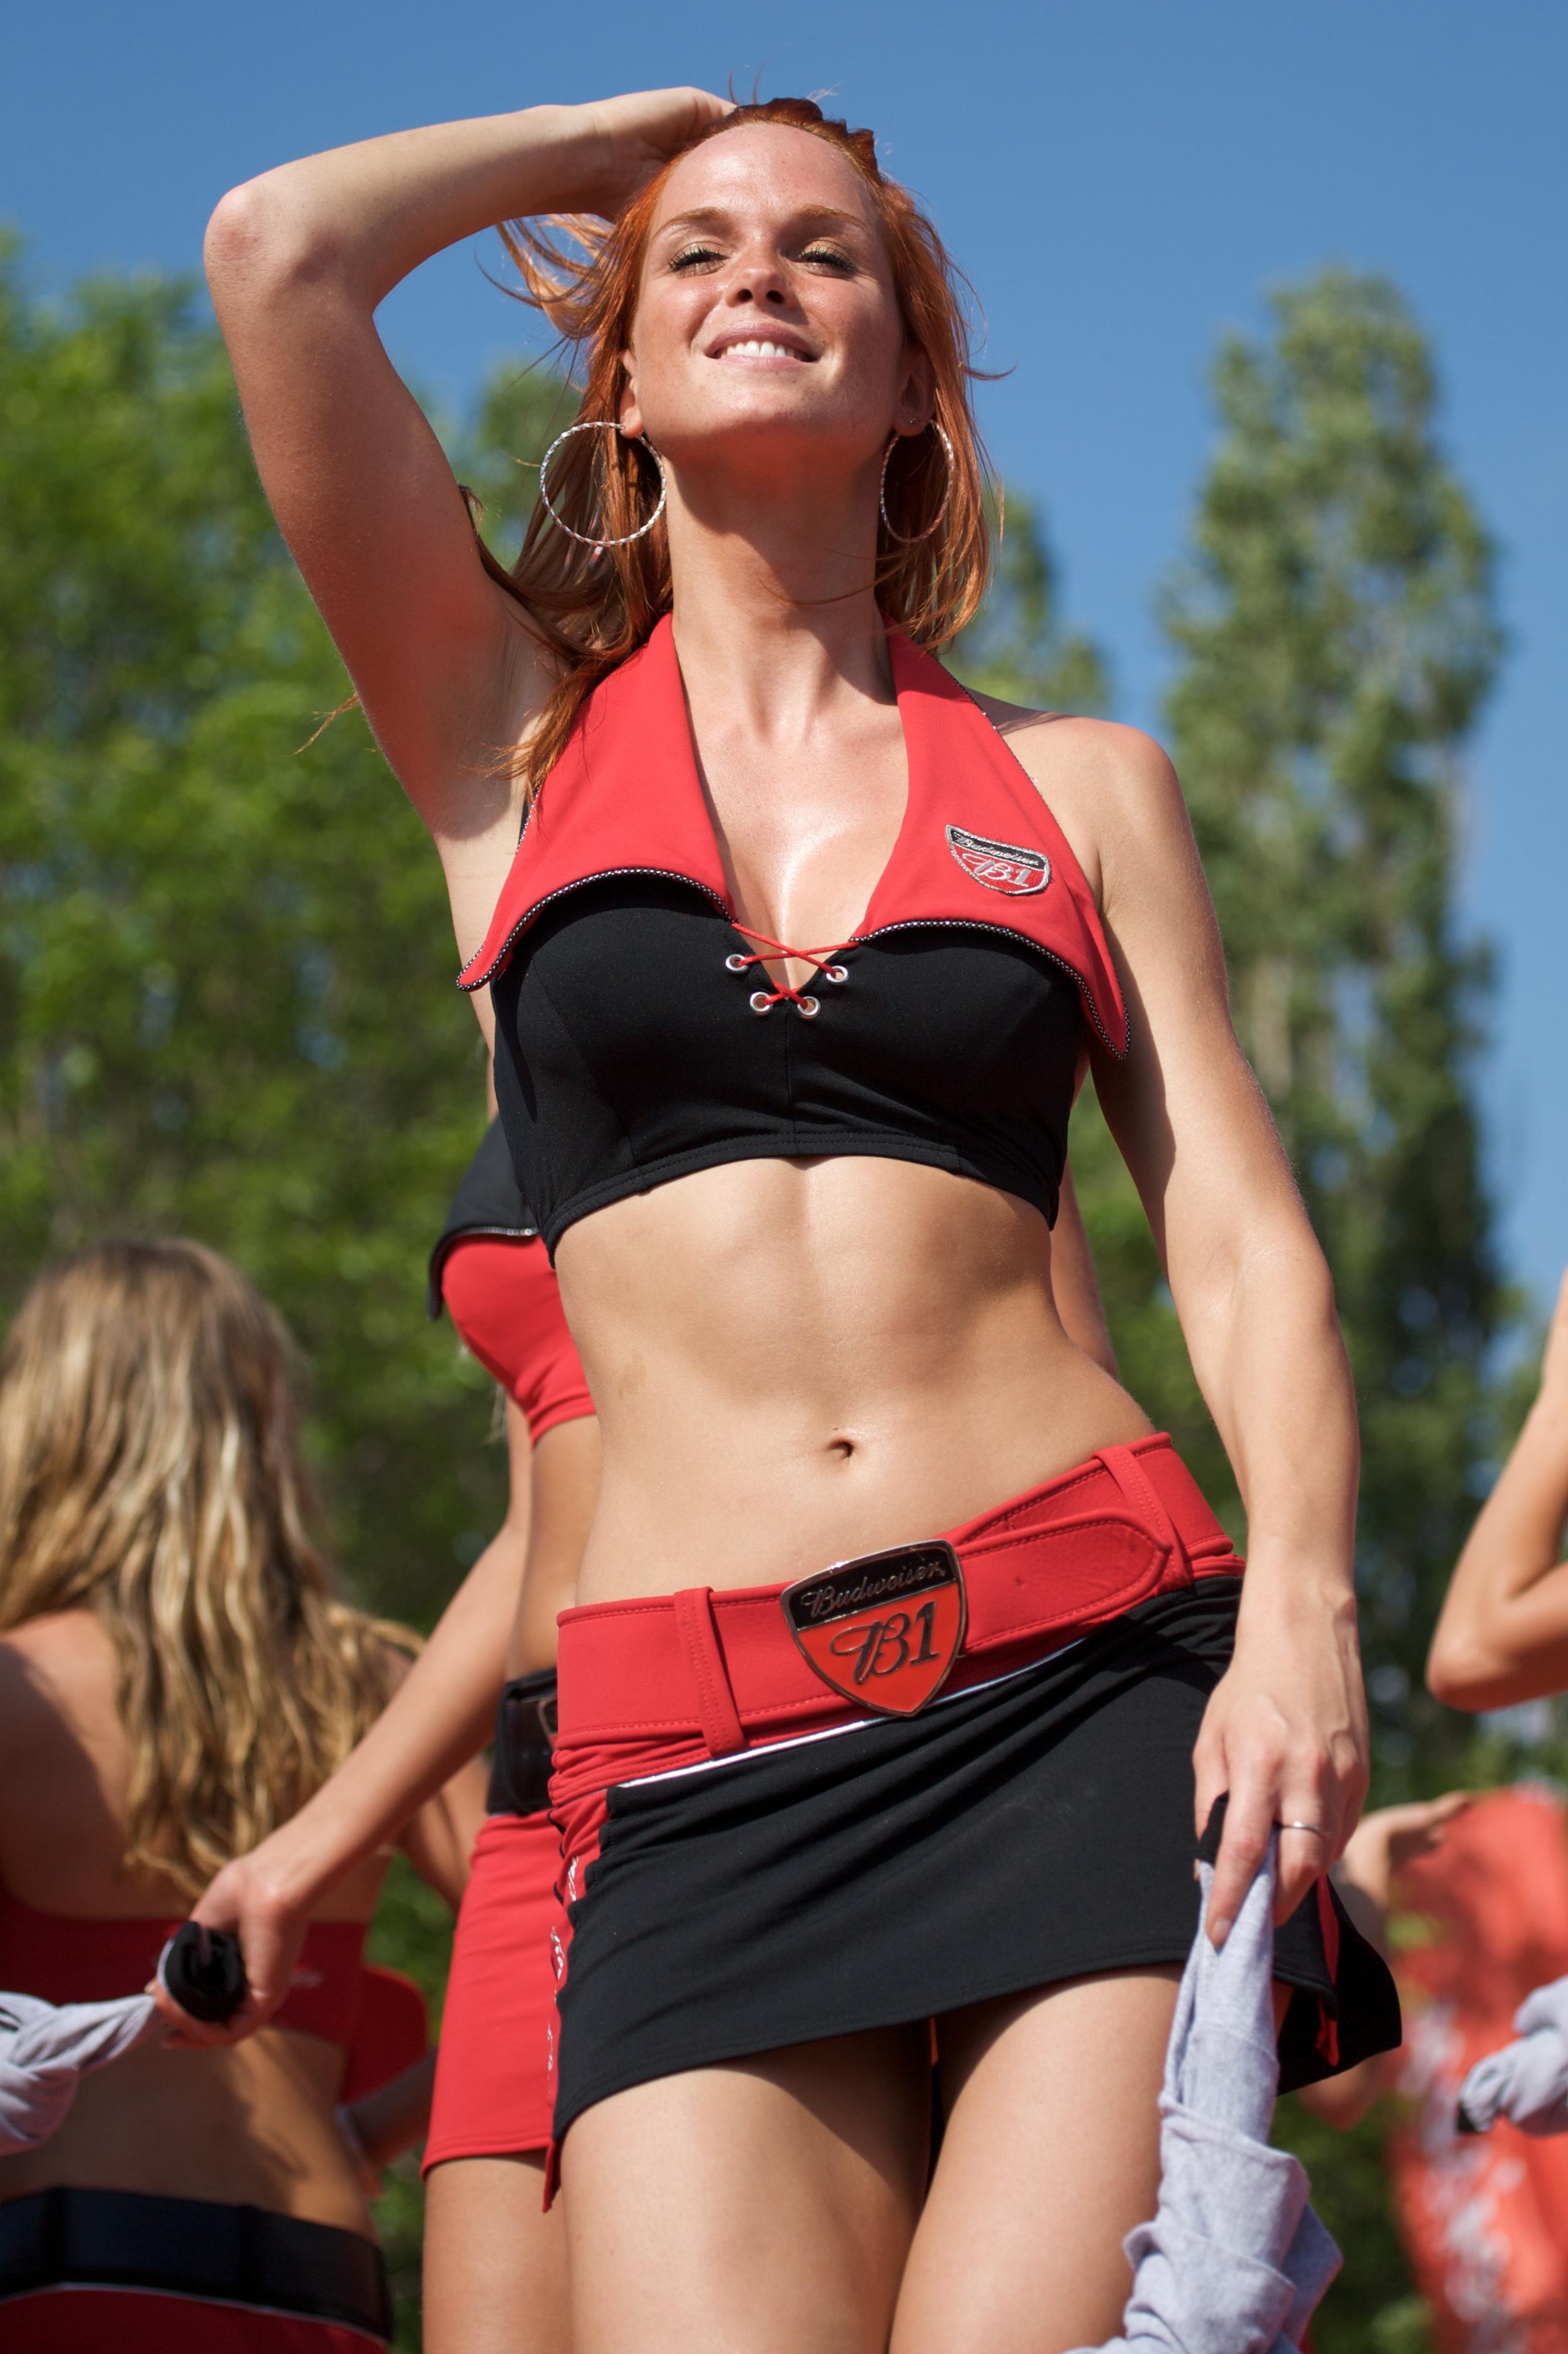 Budweiser Girl Wikipedia